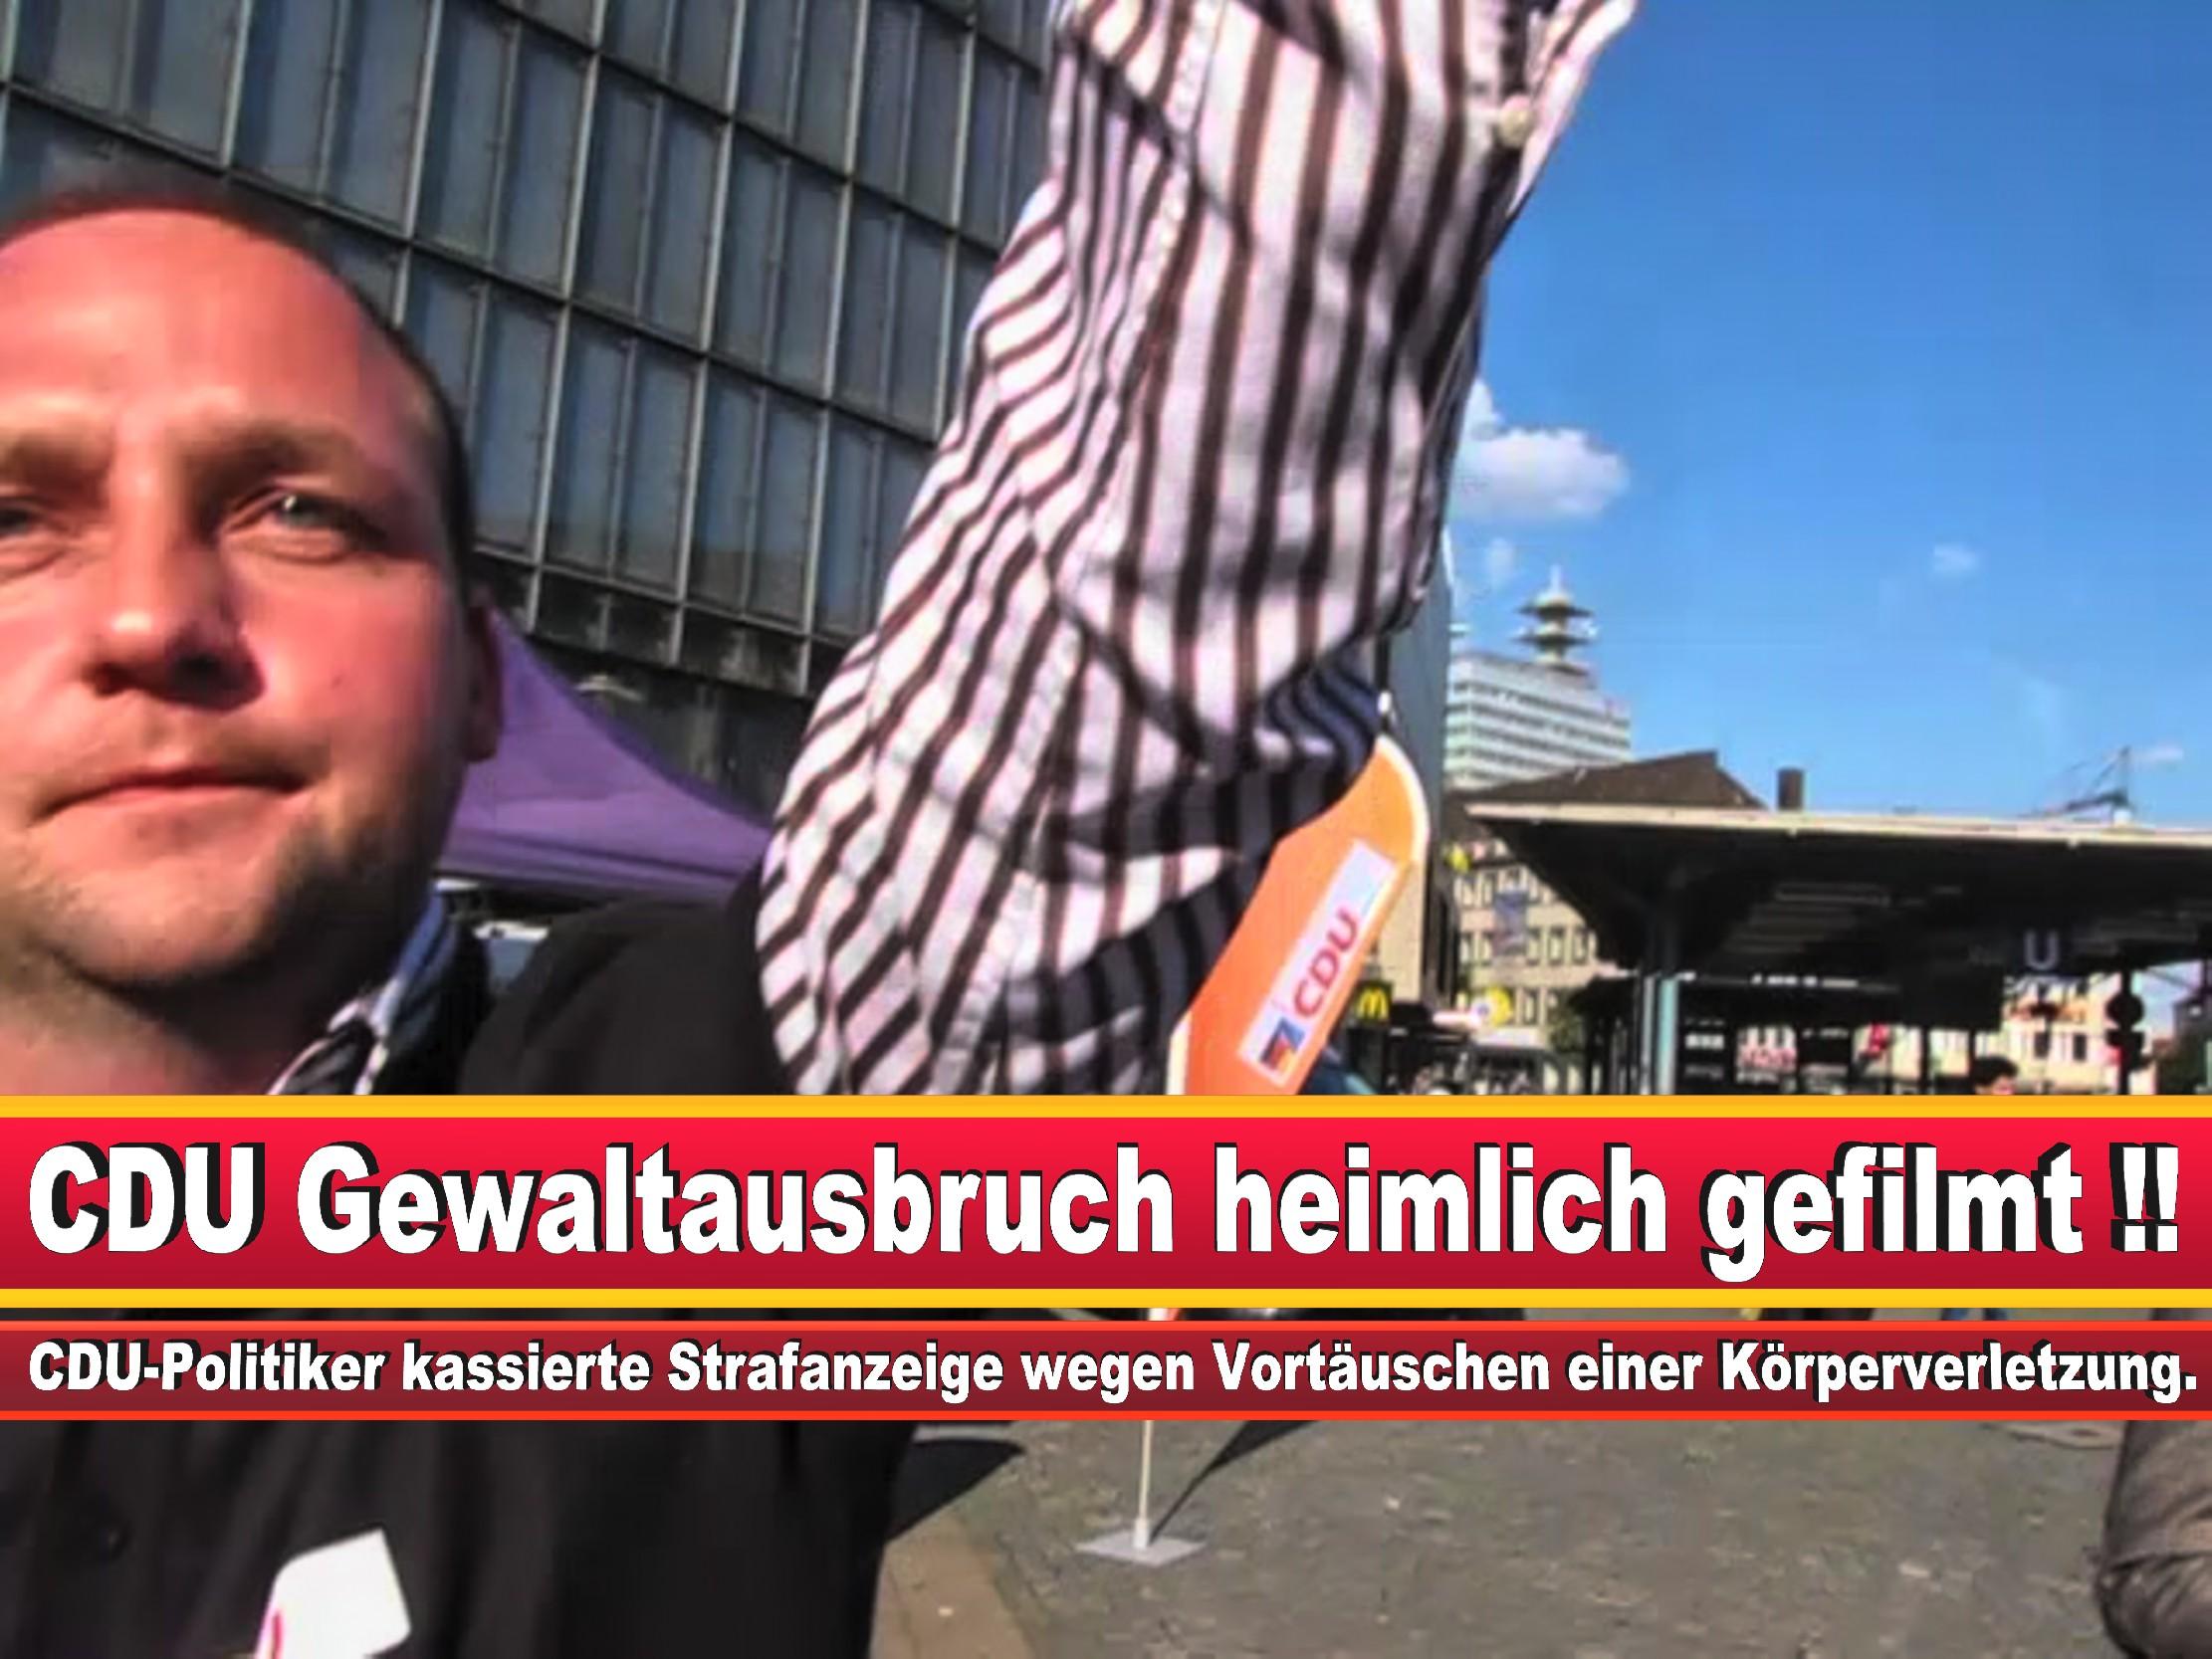 WESTFALEN BLATT GüTERSLOH FOTOS